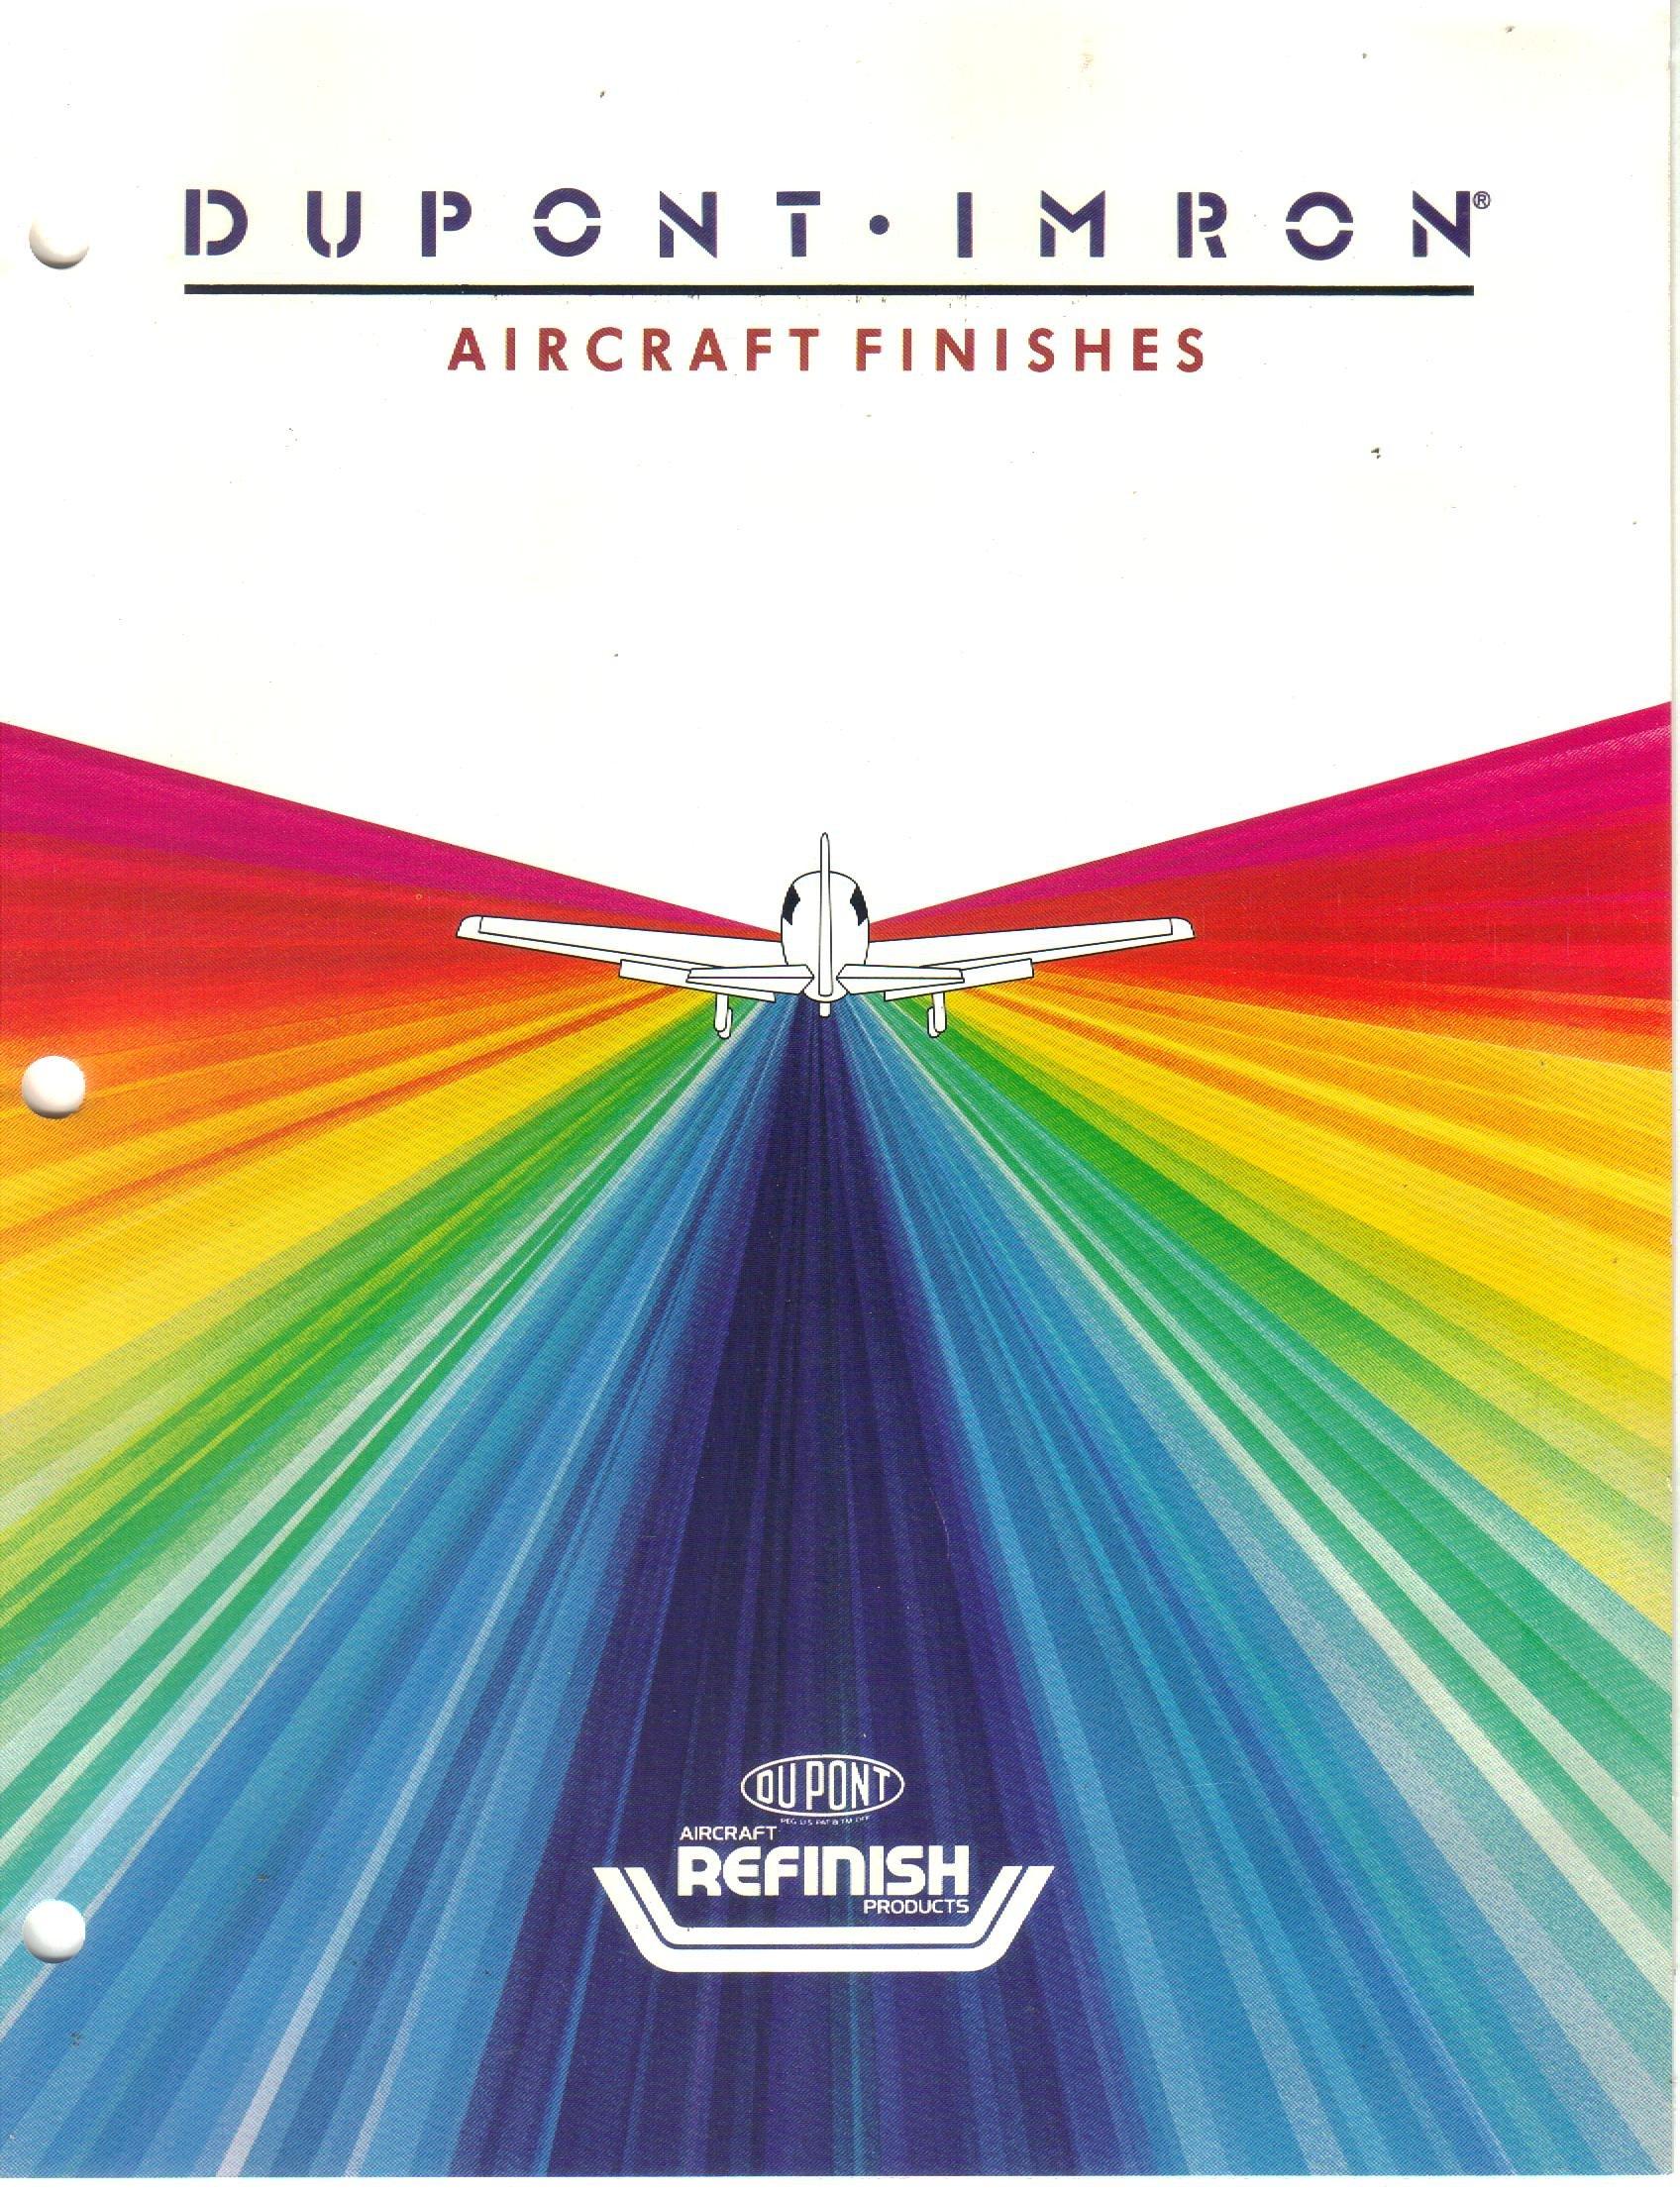 Dupont imron aircraft finishes color range sheet chart not stated dupont dupont refinish products amazon com books